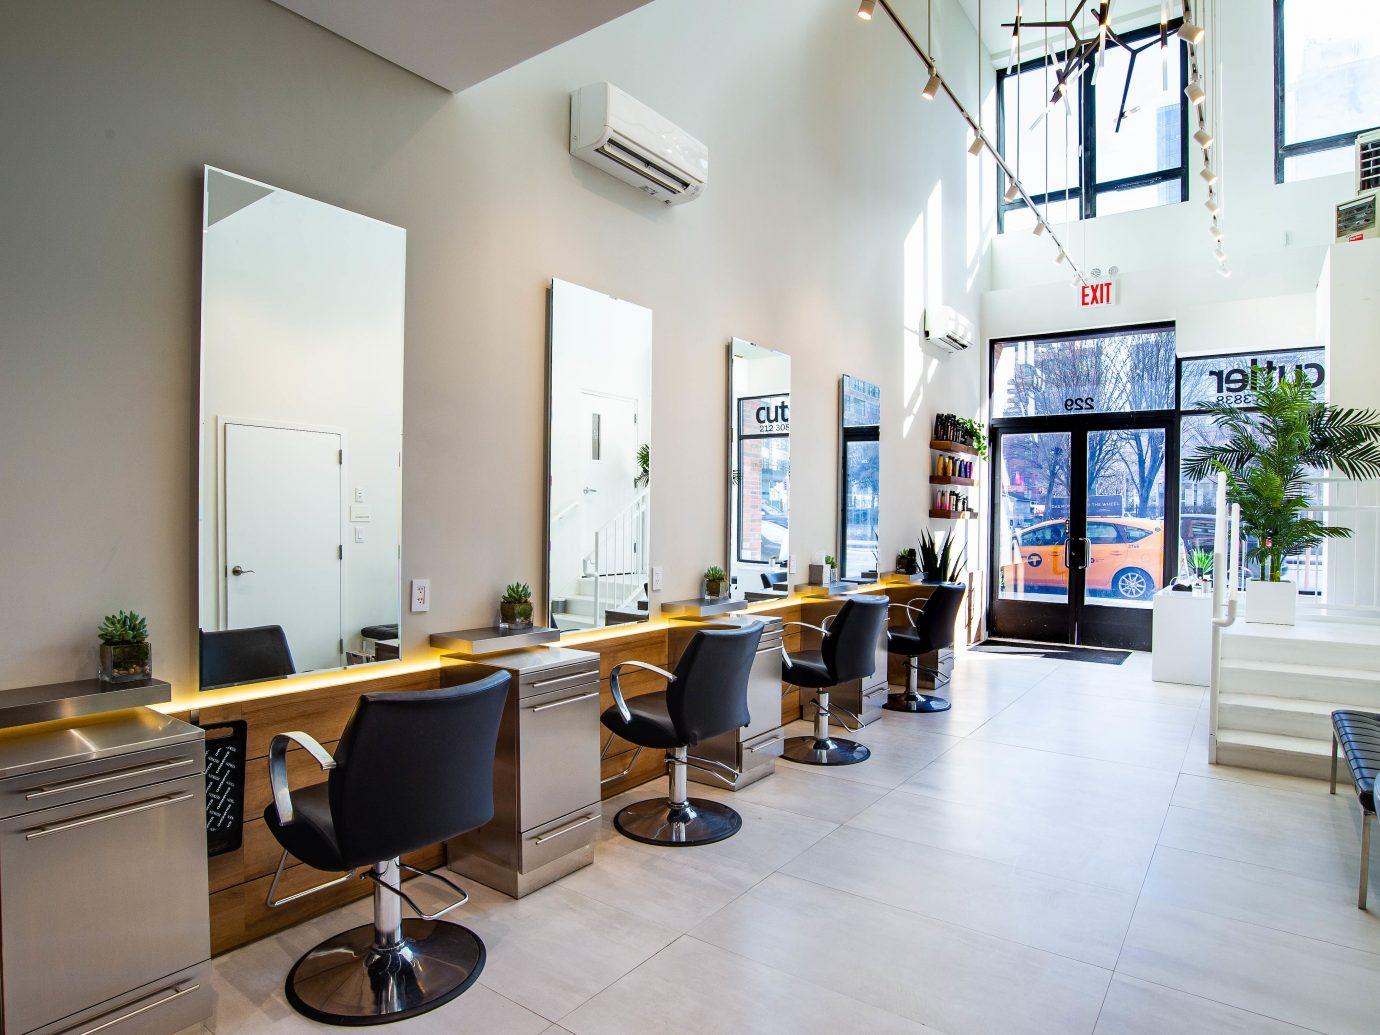 Interior of Cutler salon NYC